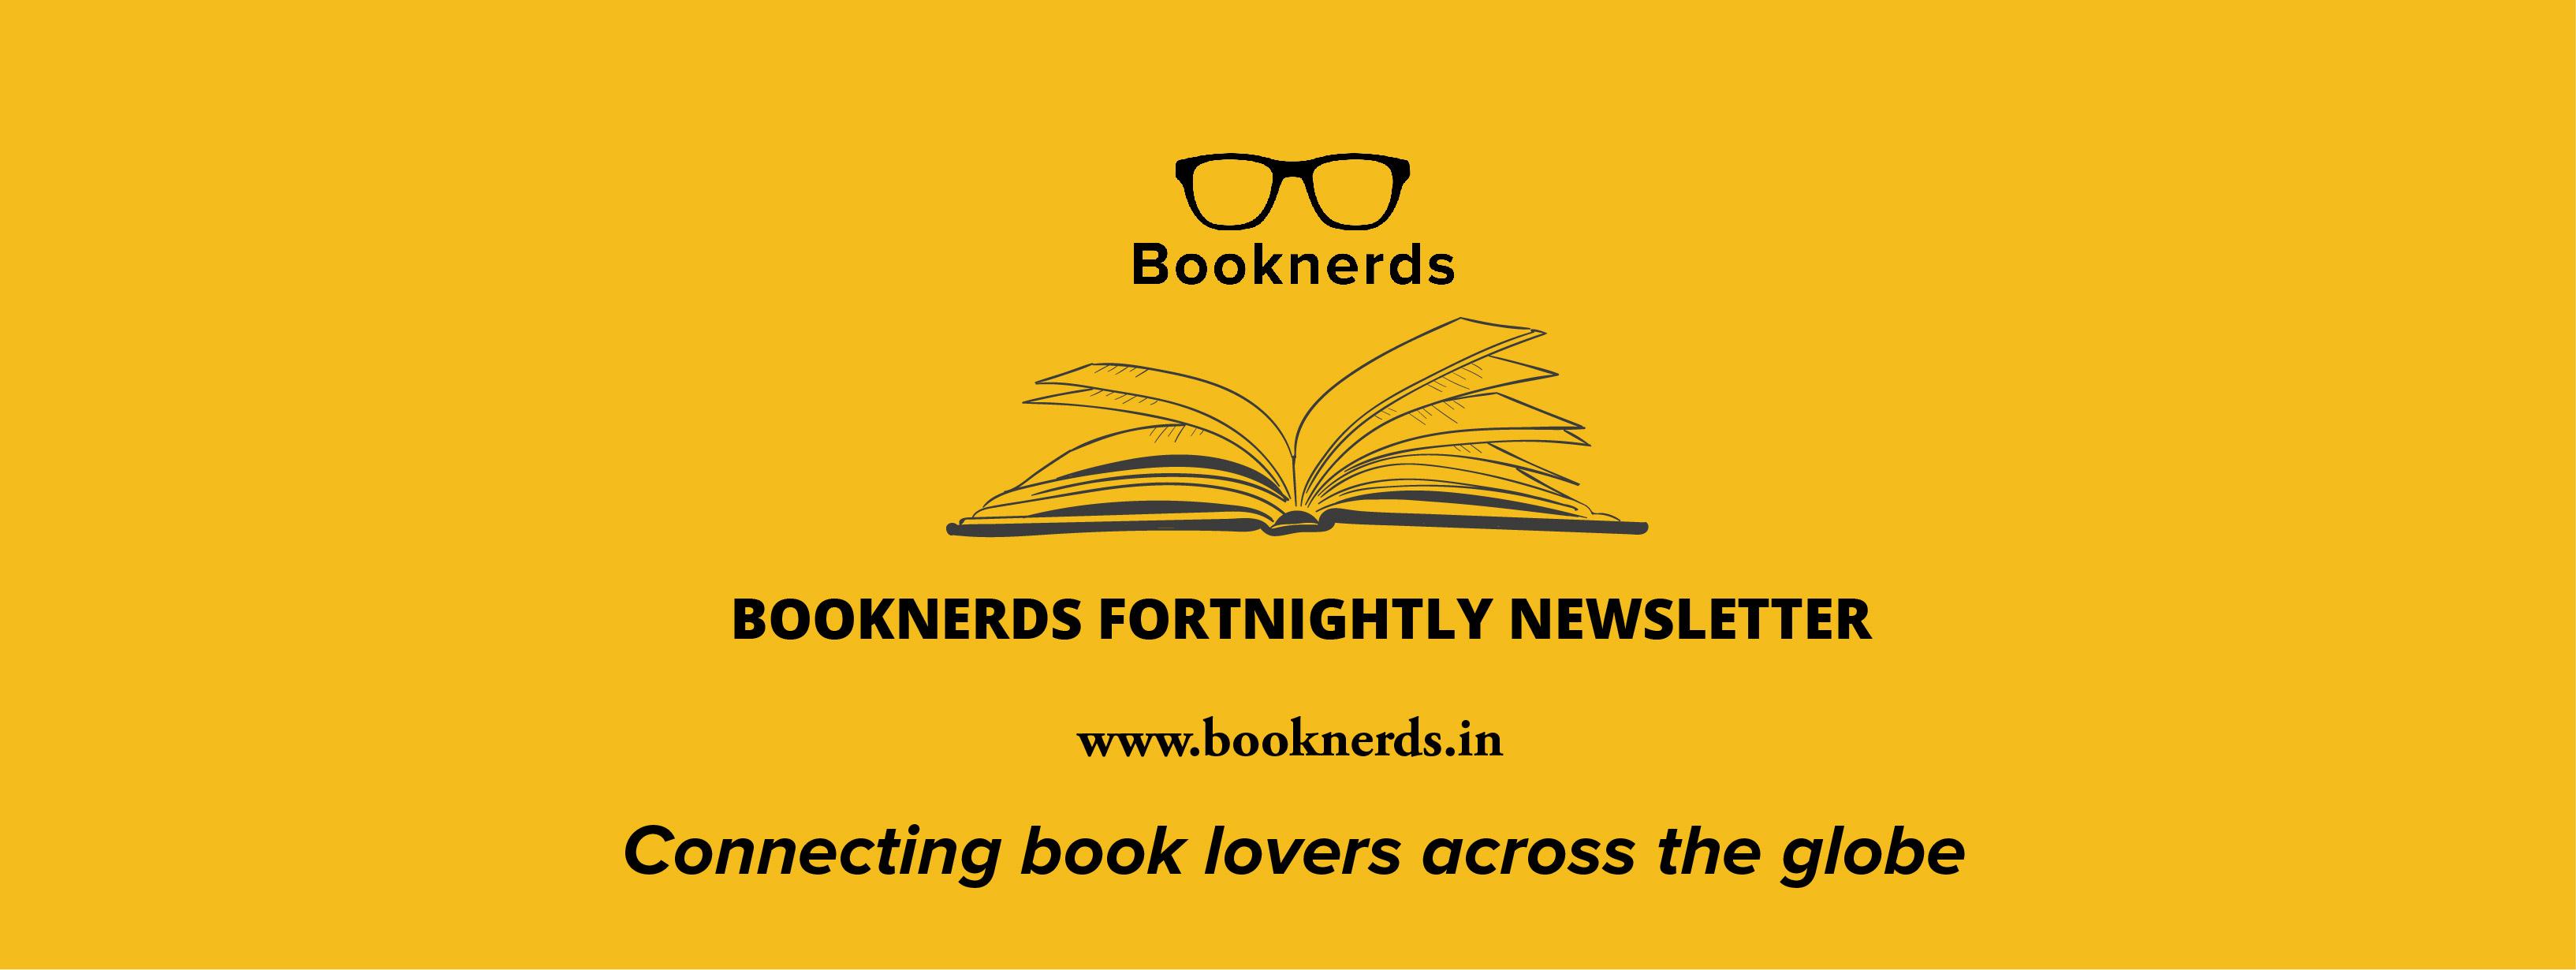 Booknerds Fortnightly Newsletter|Christmas Edition| December 15|2020